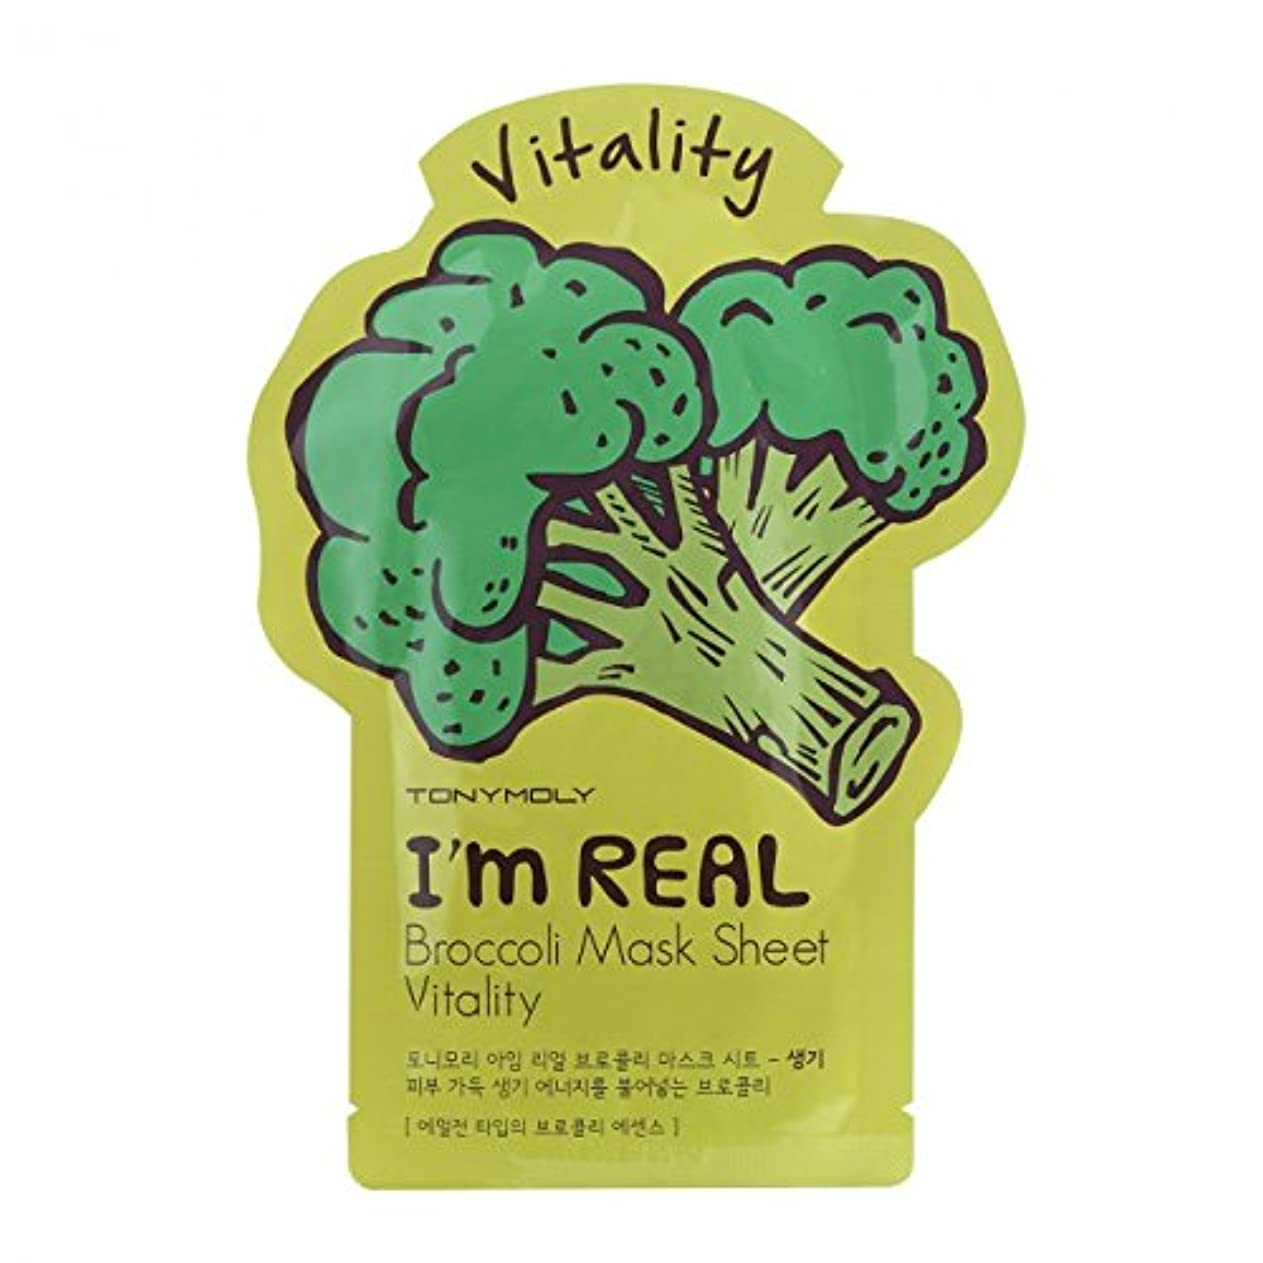 TONYMOLY I'm Real Broccoli Mask Sheet Vitality (並行輸入品)